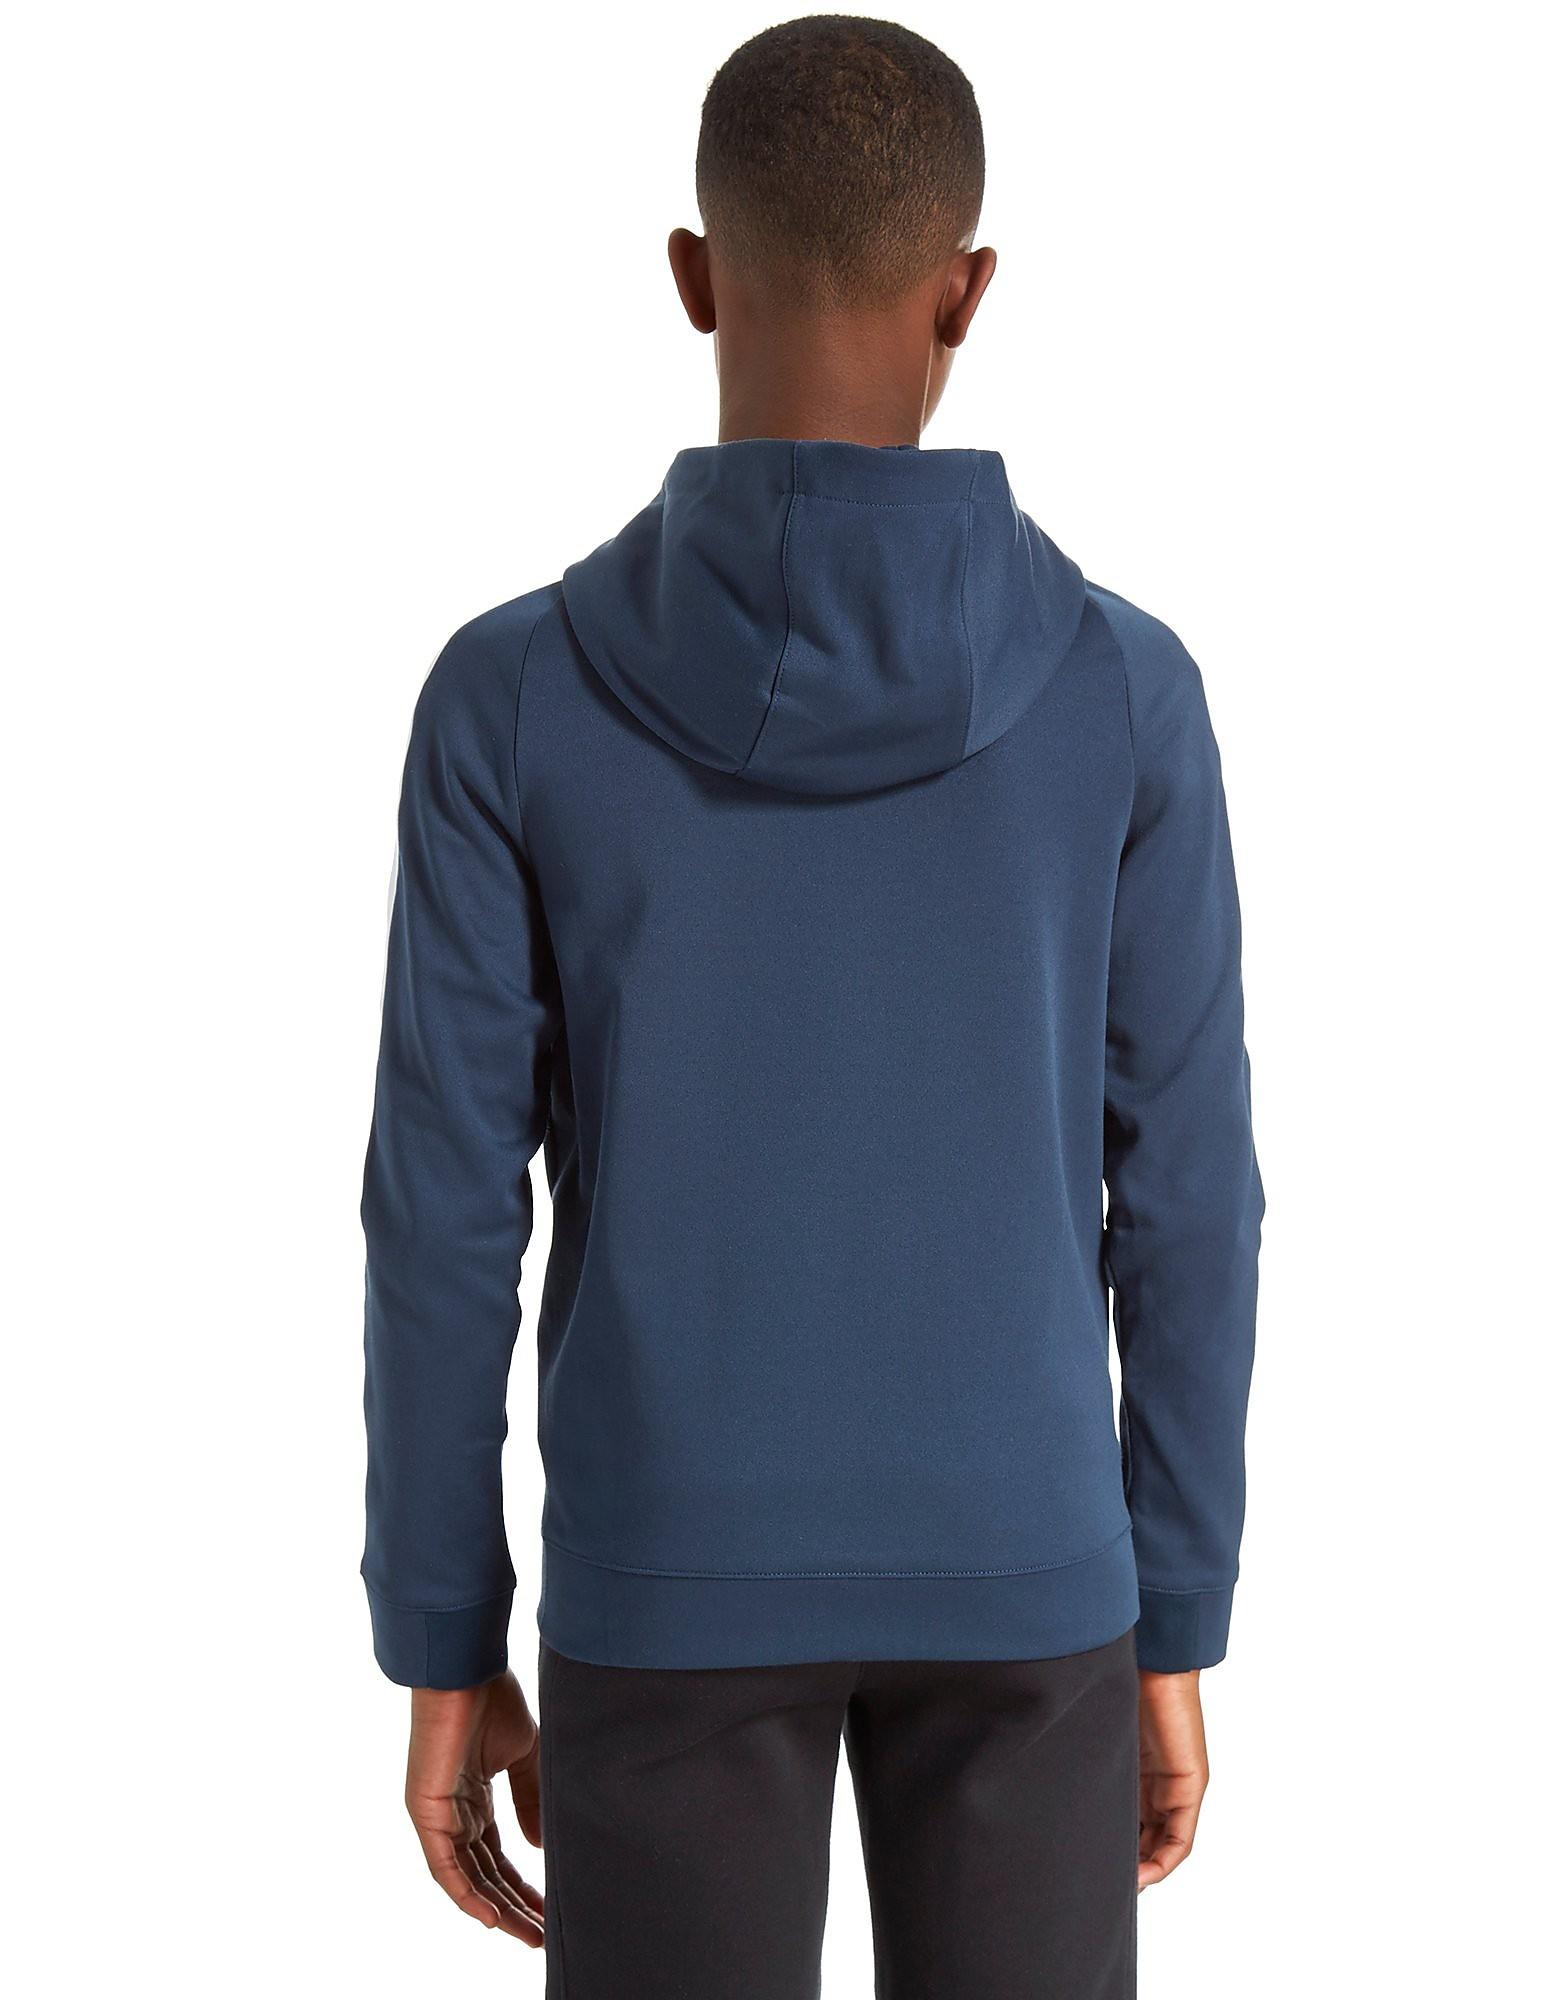 Nike chaqueta Tribute Full-Zip Poly júnior